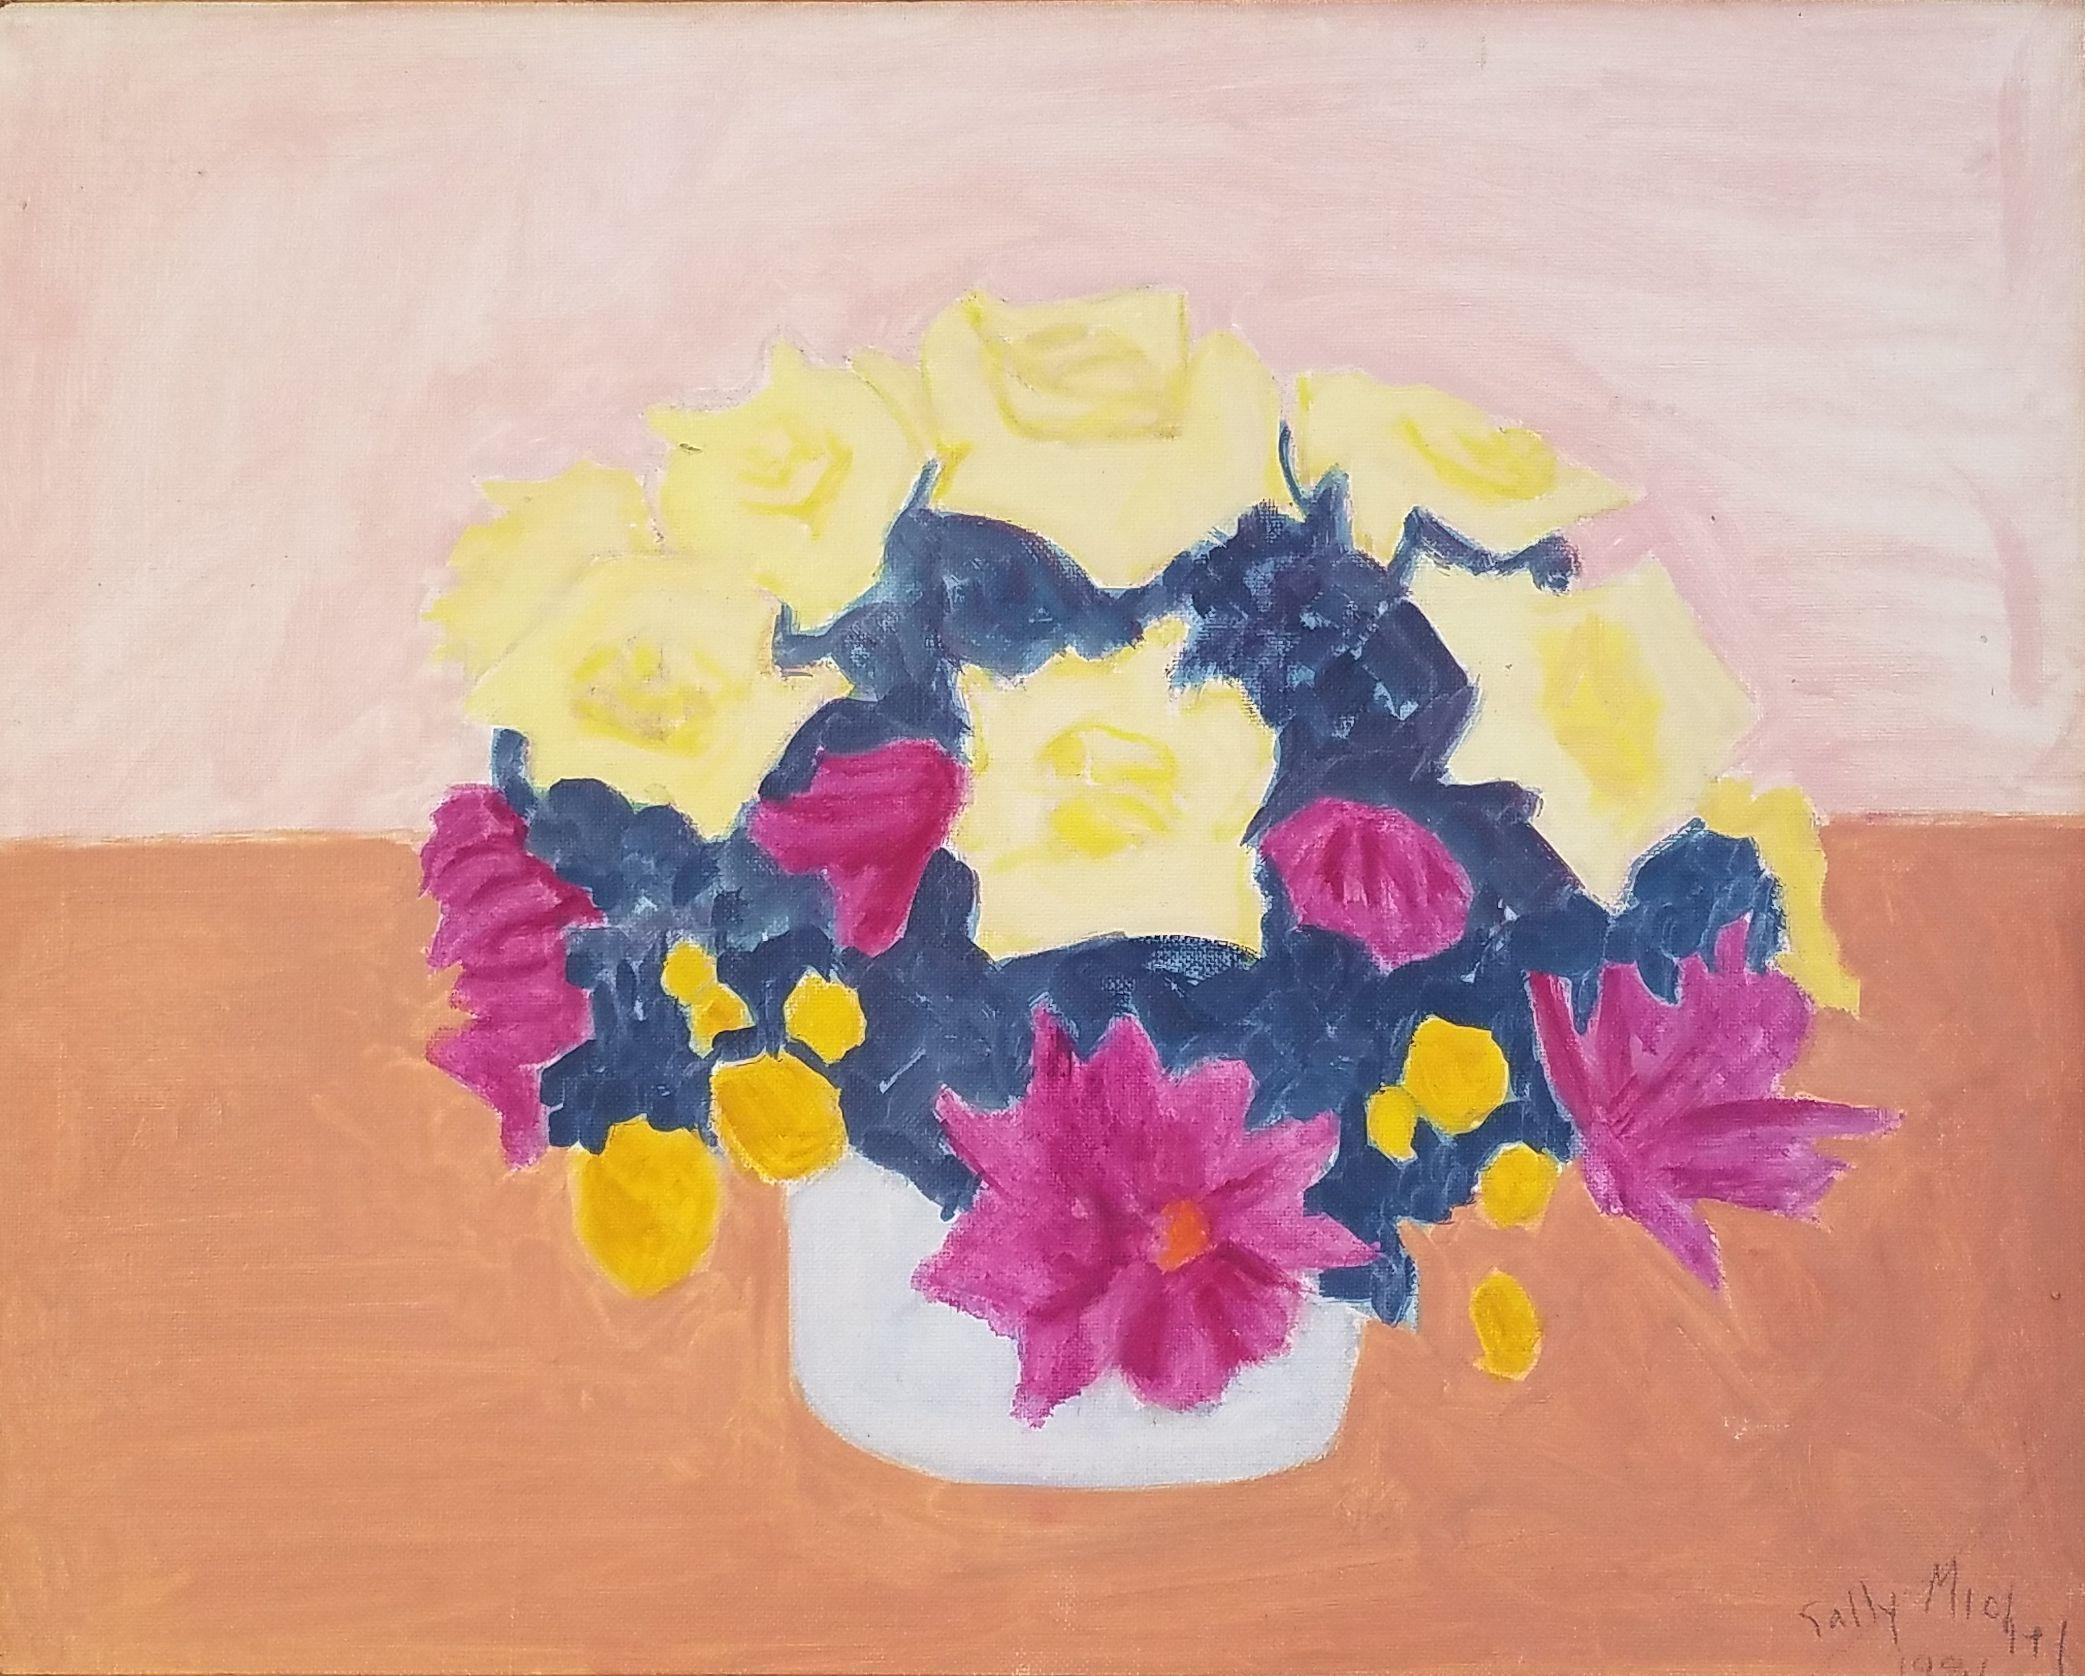 """Floral Still Life,"" Sally Michel Avery, Female American Modernist Bright Pastel"